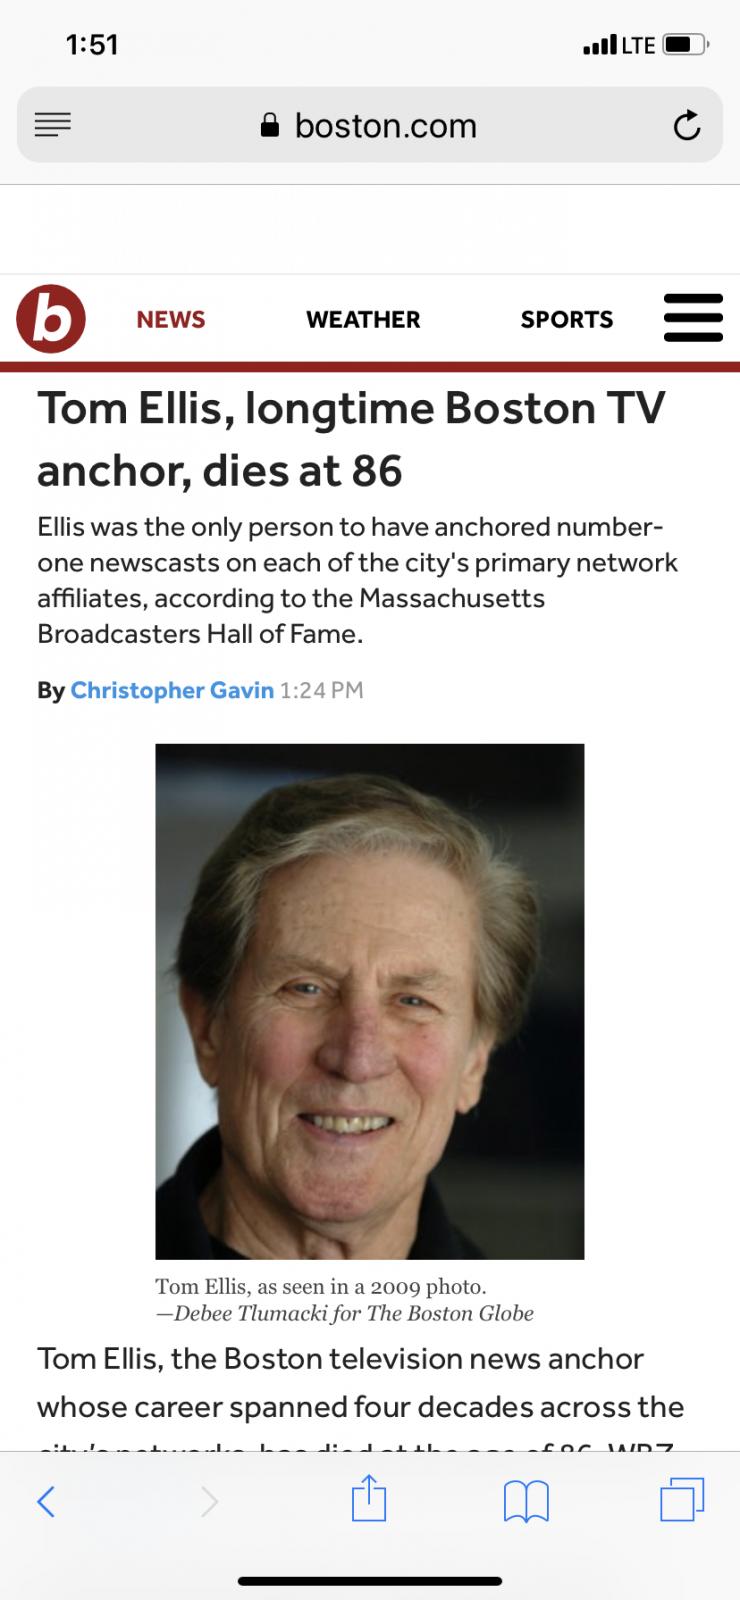 Tom Ellis Boston New York News Anchor will not be down for